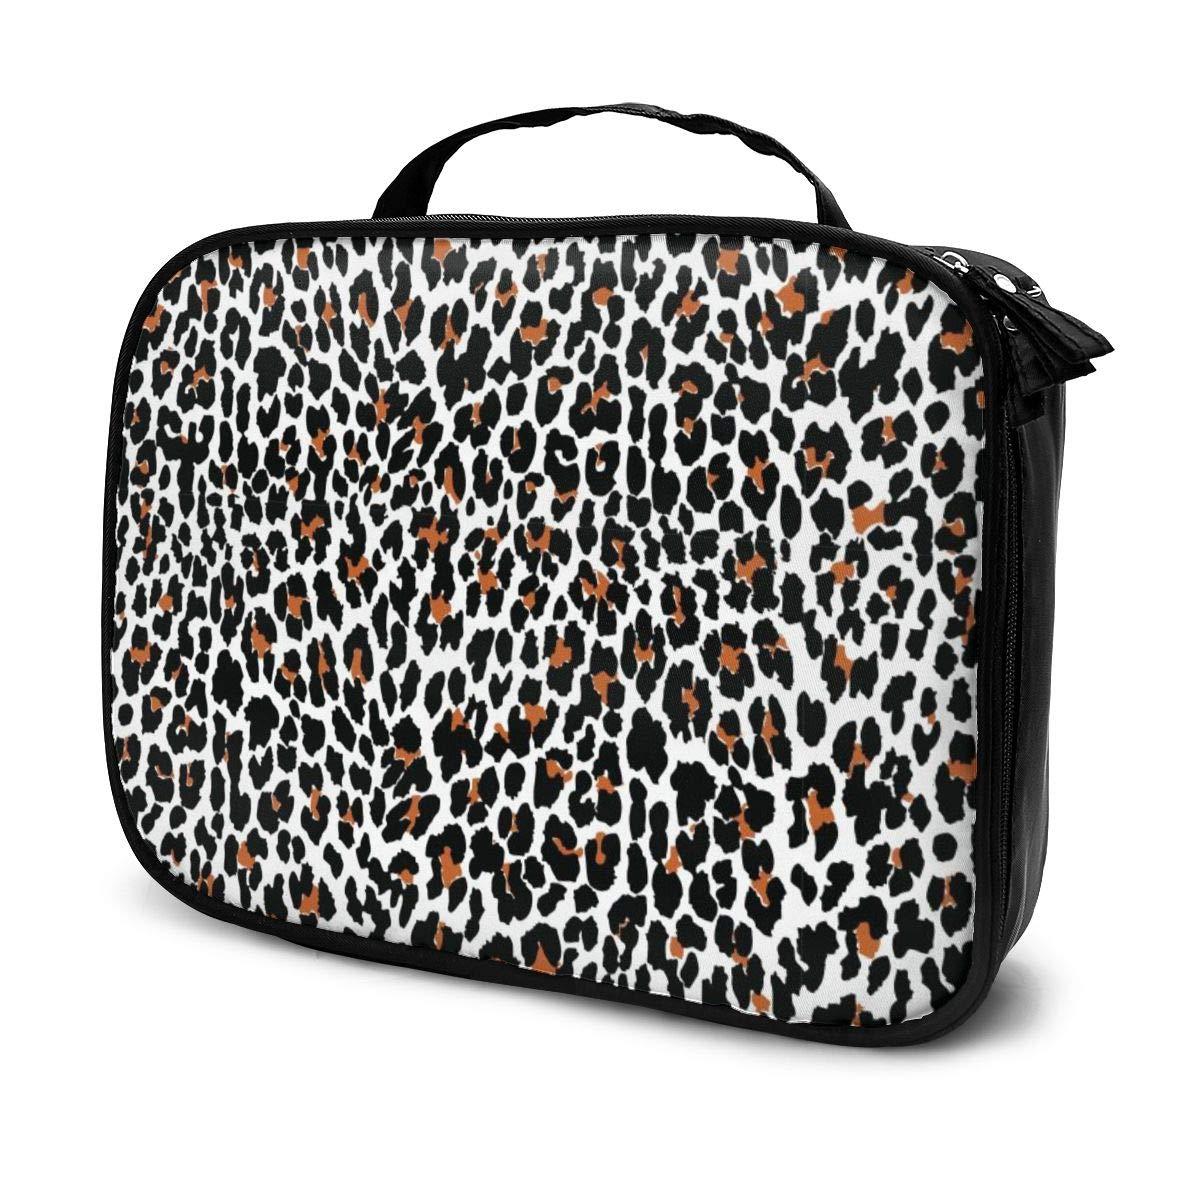 Leopard Dedication Print Makeup BagTravel Case Train shipfree